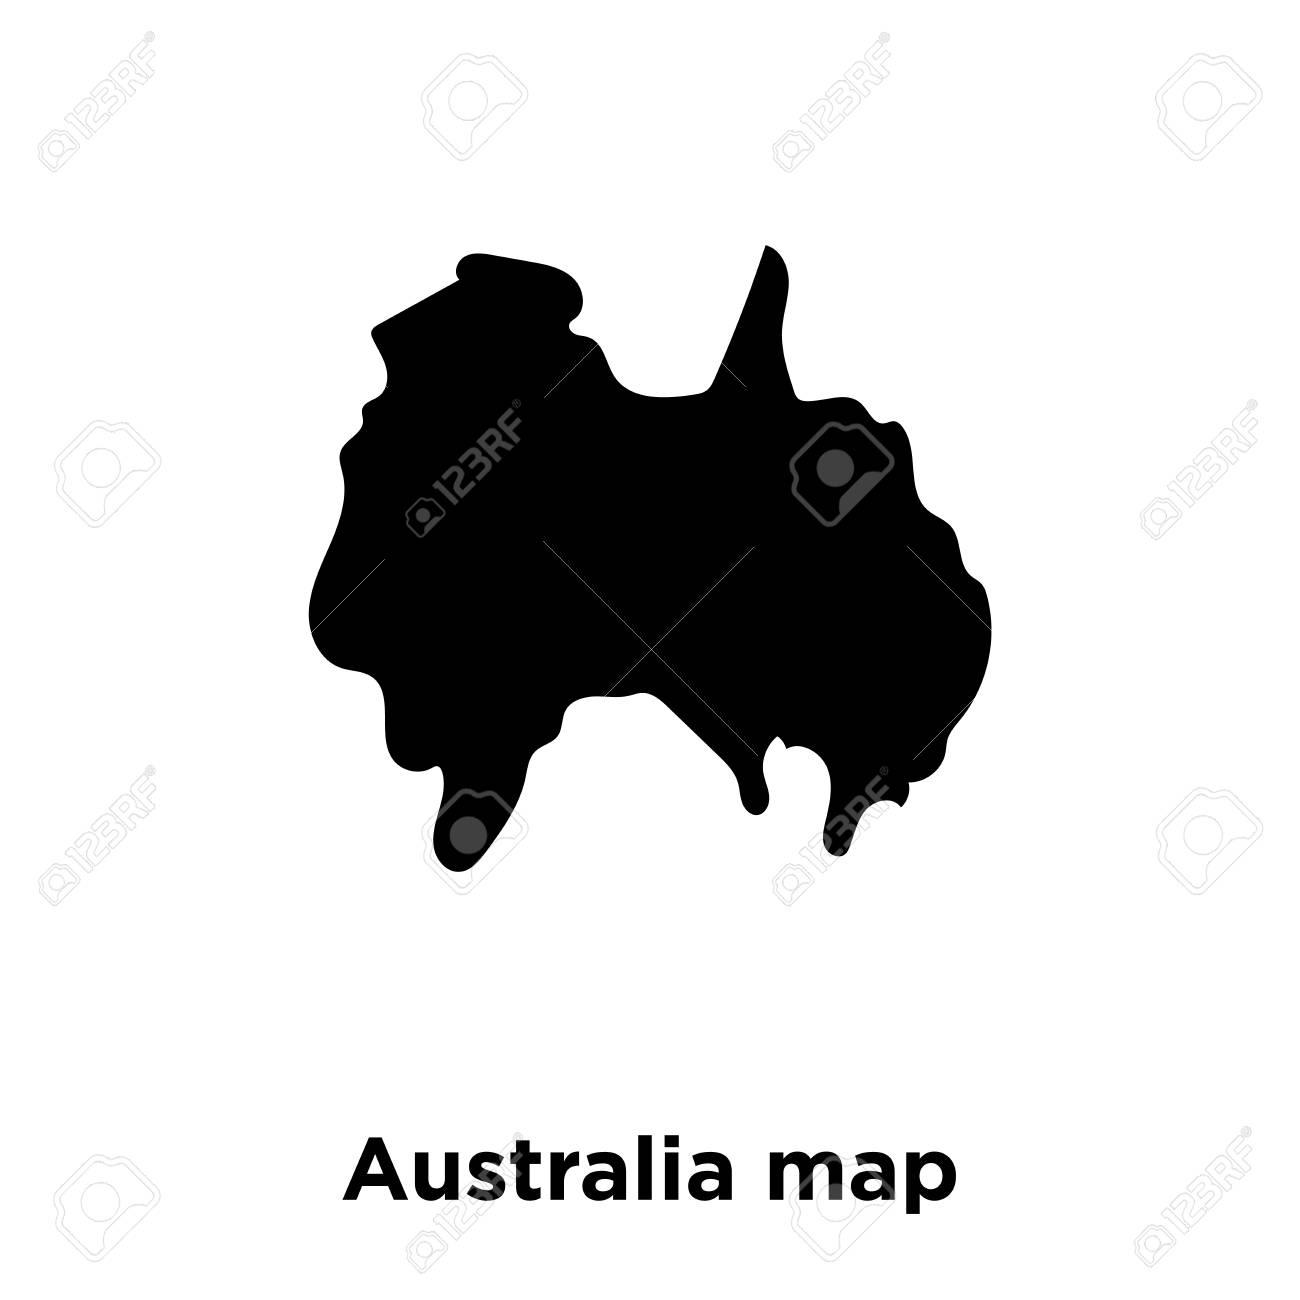 Map Of Australia Logo.Australia Map Icon Vector Isolated On White Background Logo